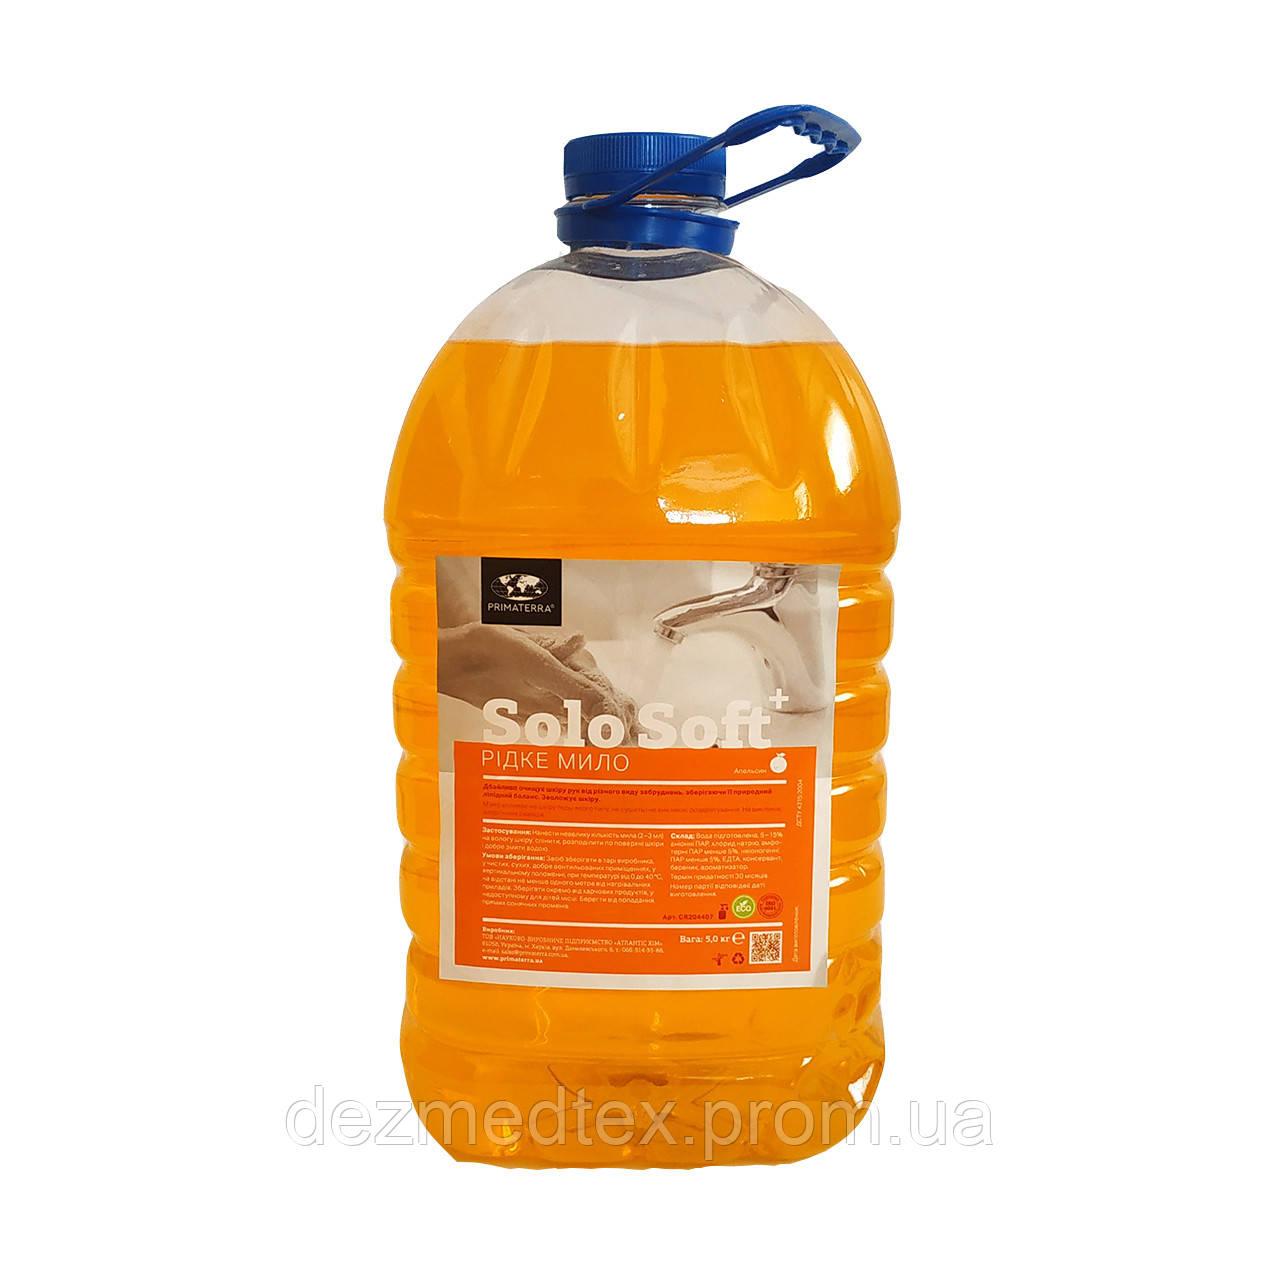 Жидкое мыло, 5кг (ПЭТ), апельсин